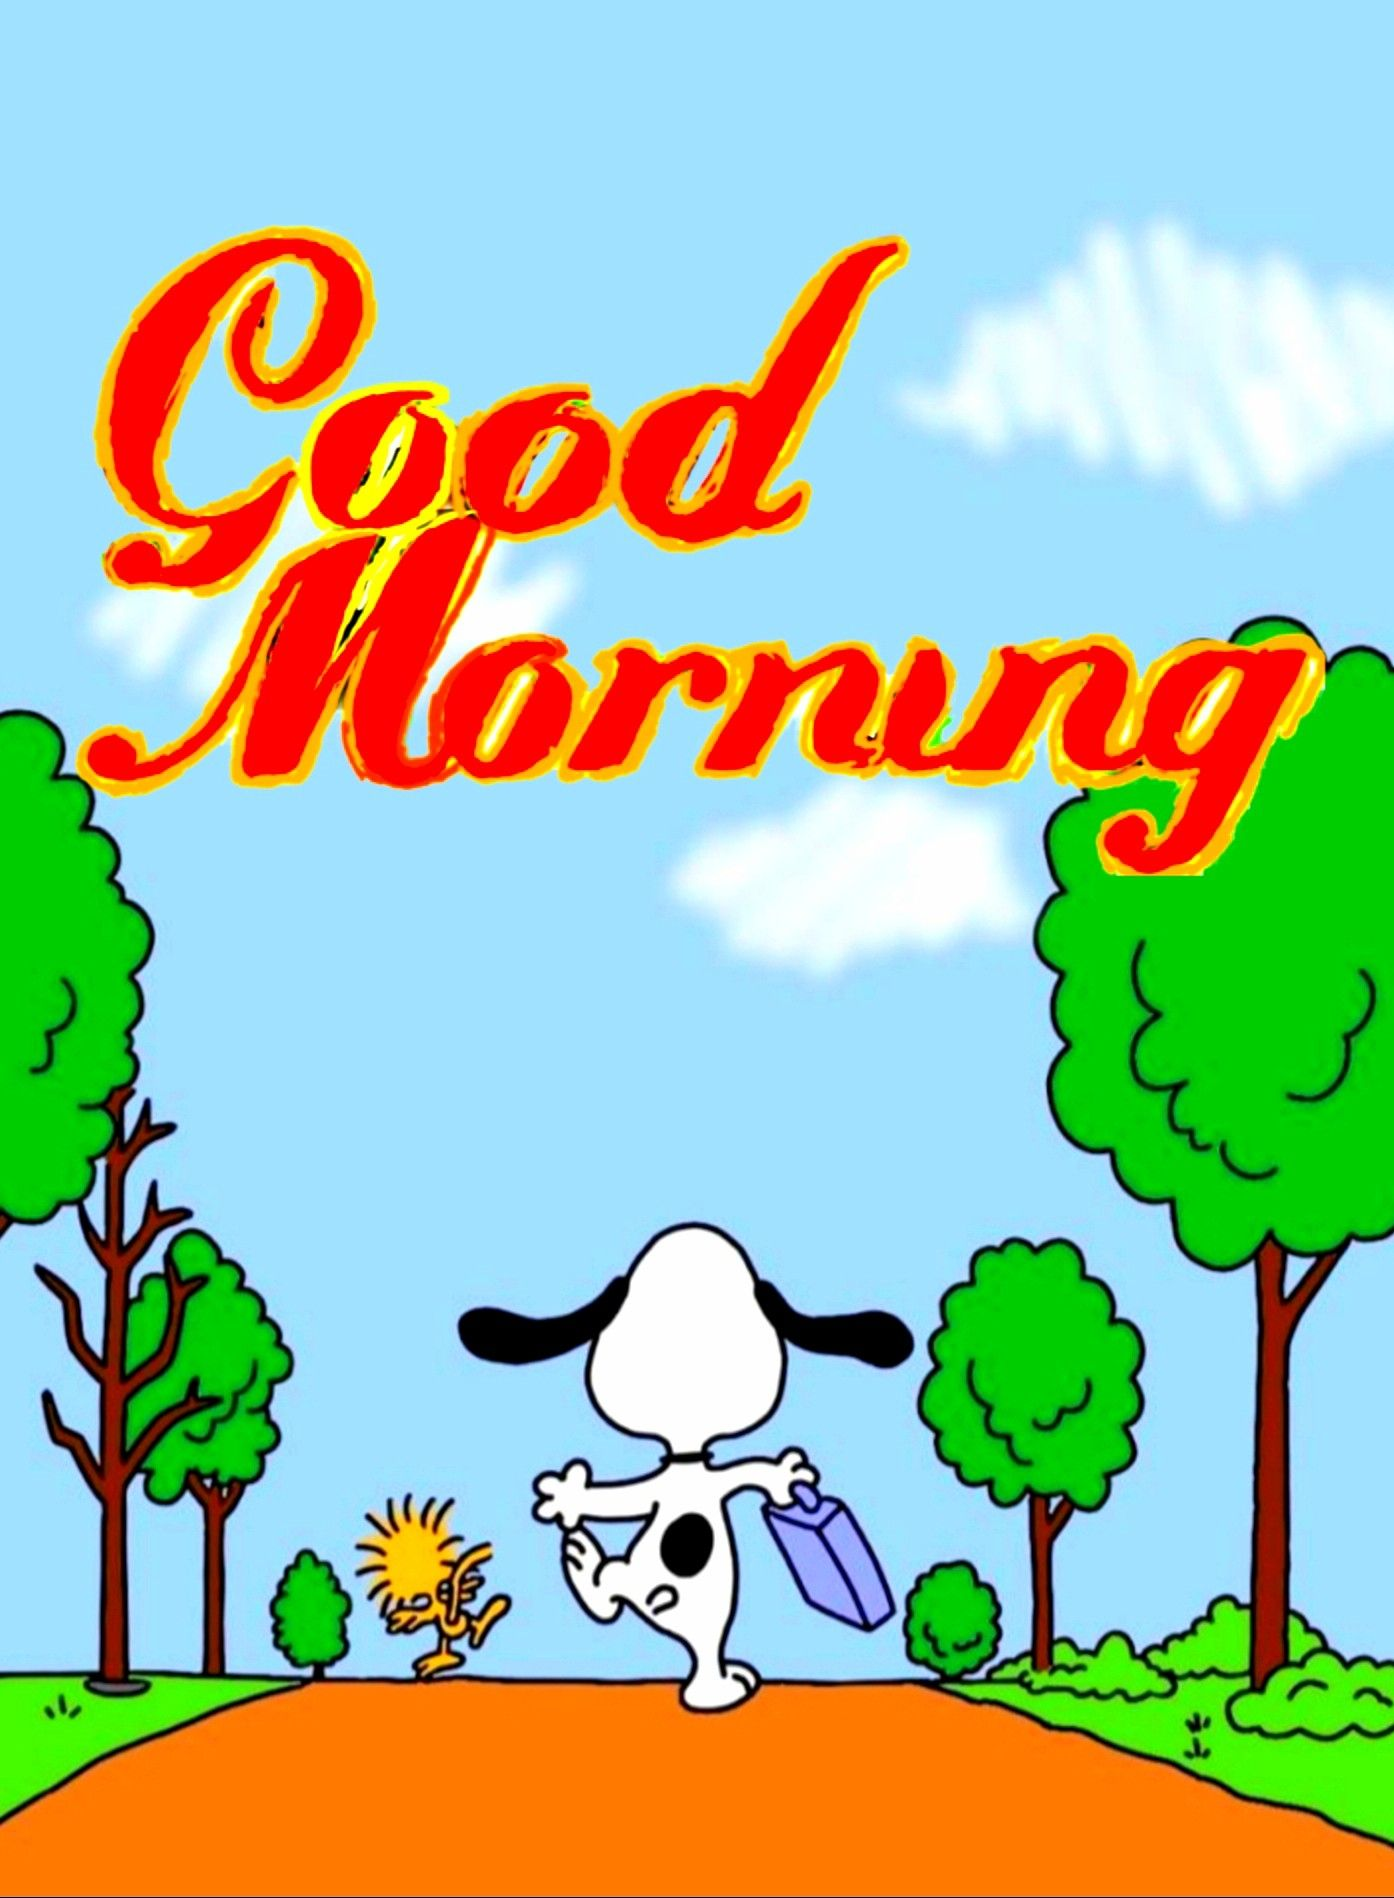 Gif snoopy guten morgen guten morgen